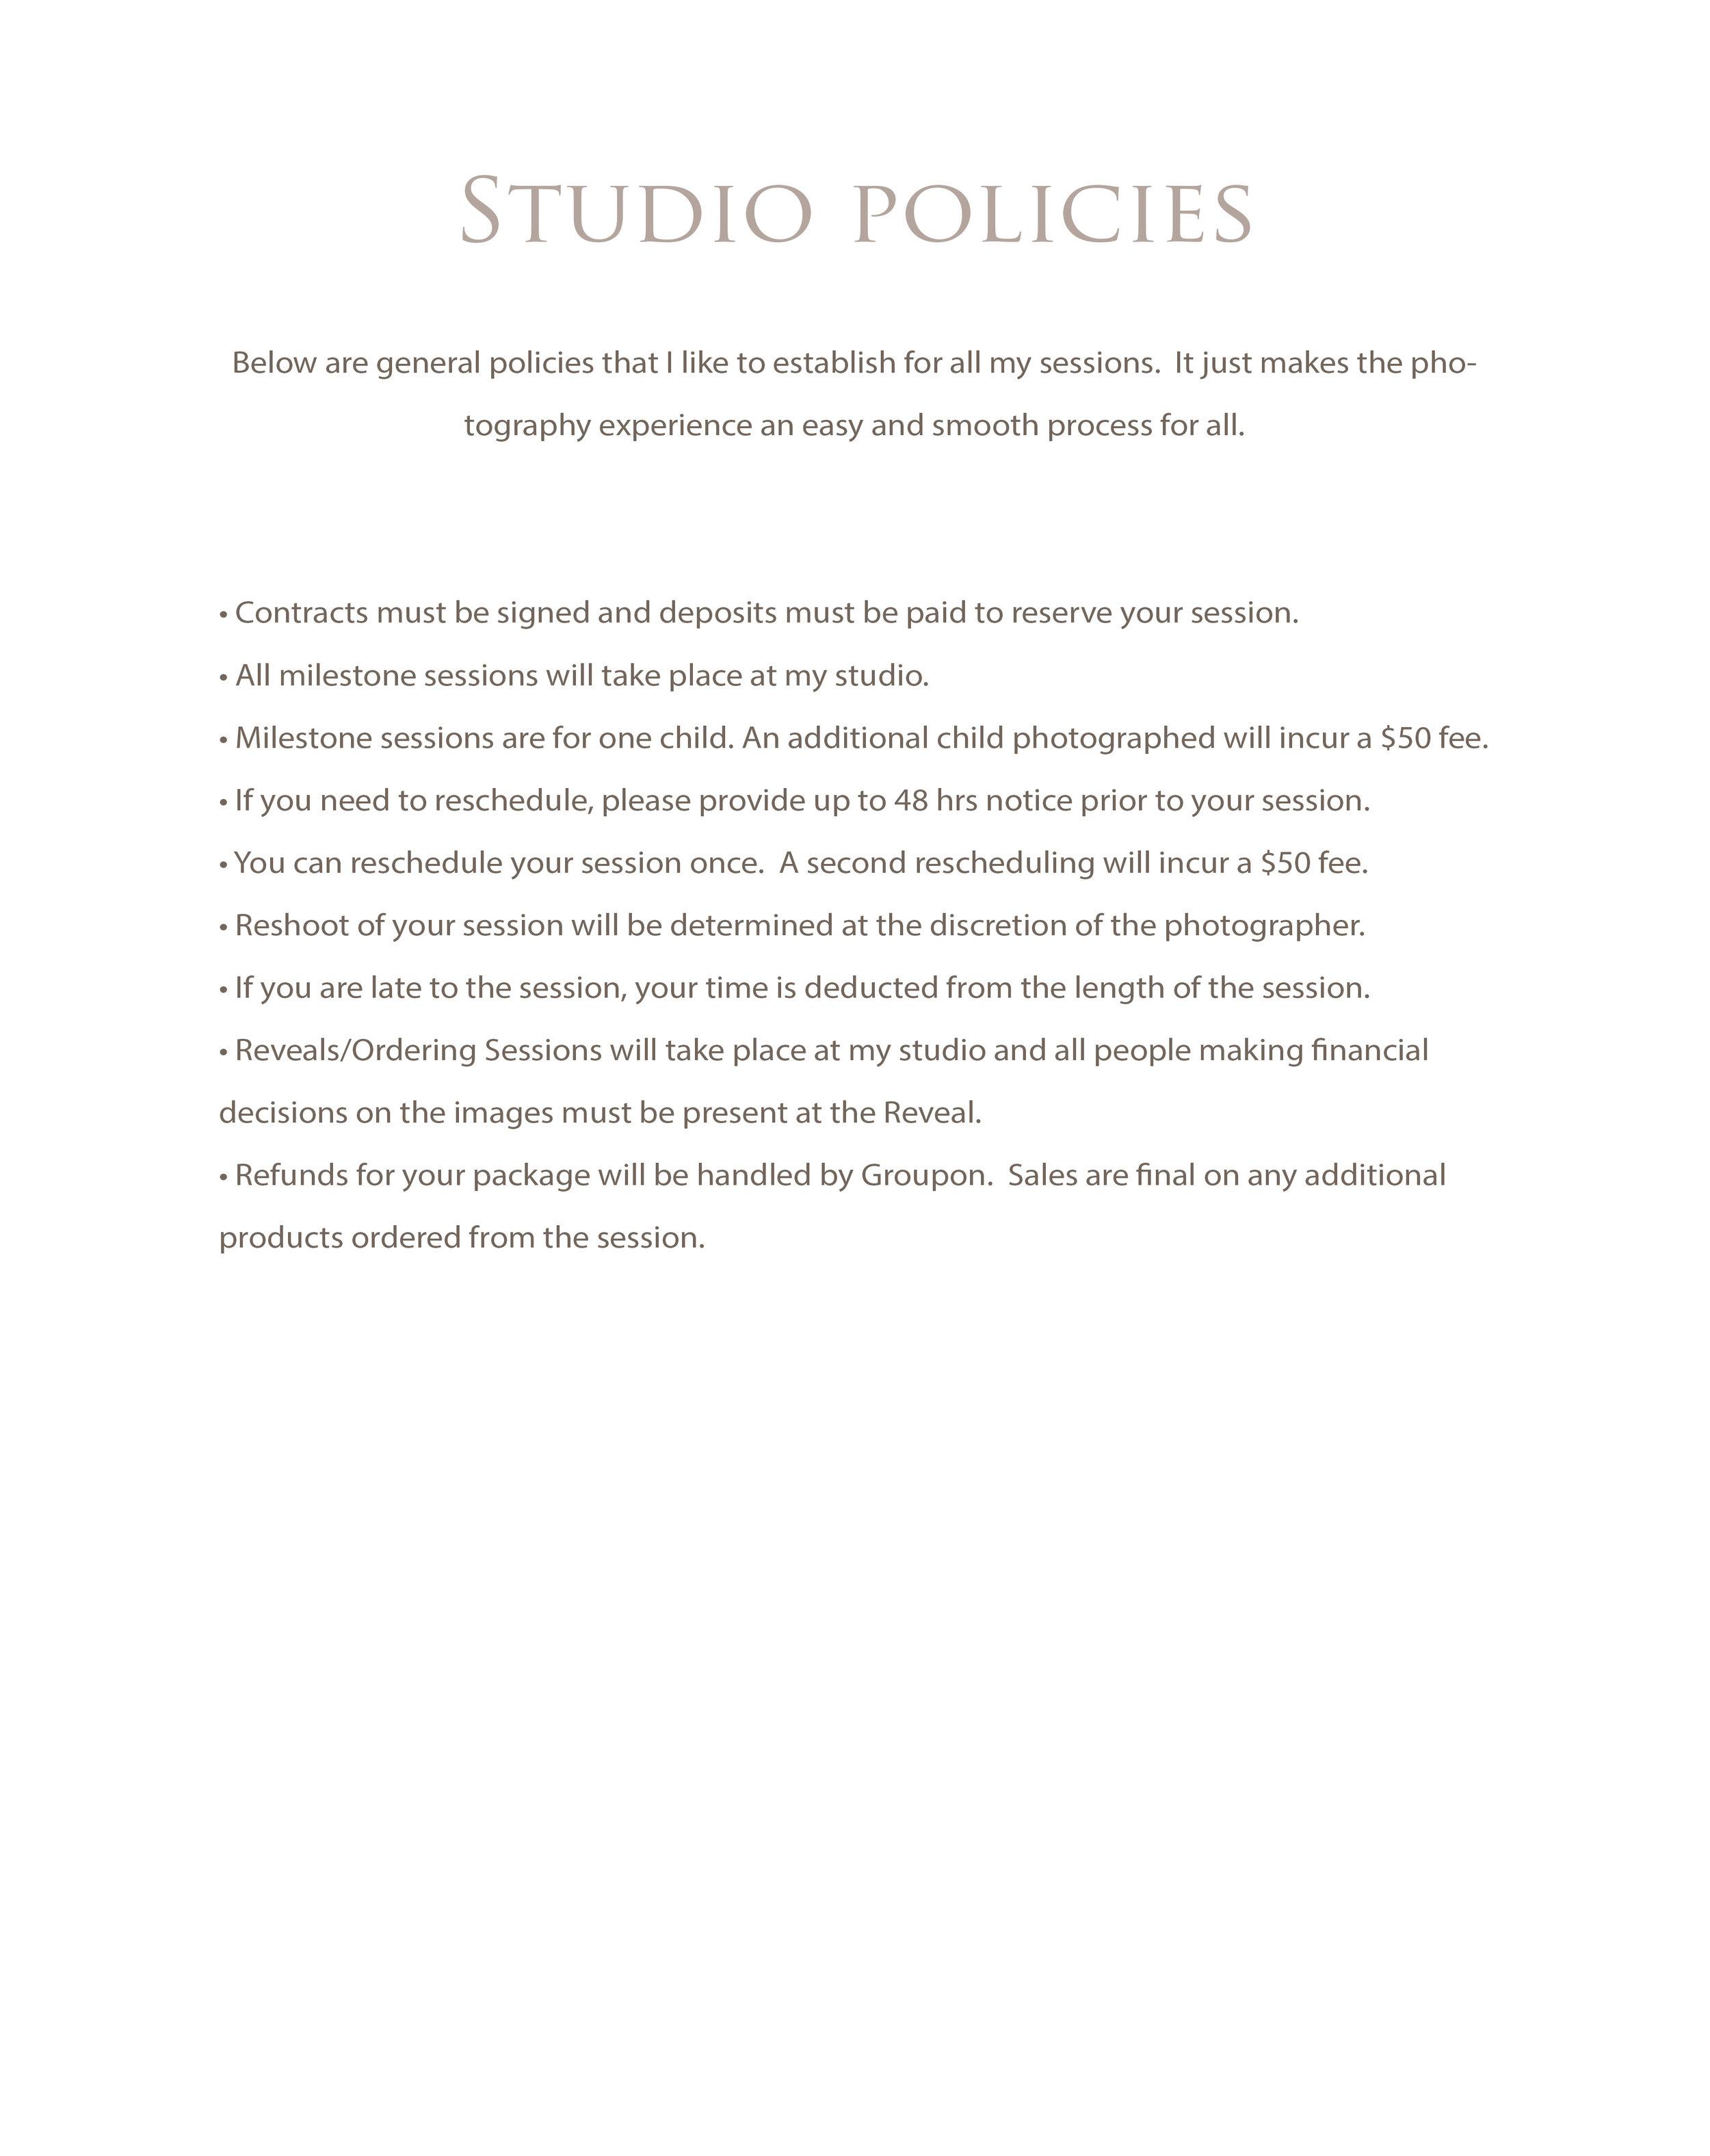 groupon prep guide_Policies.jpg